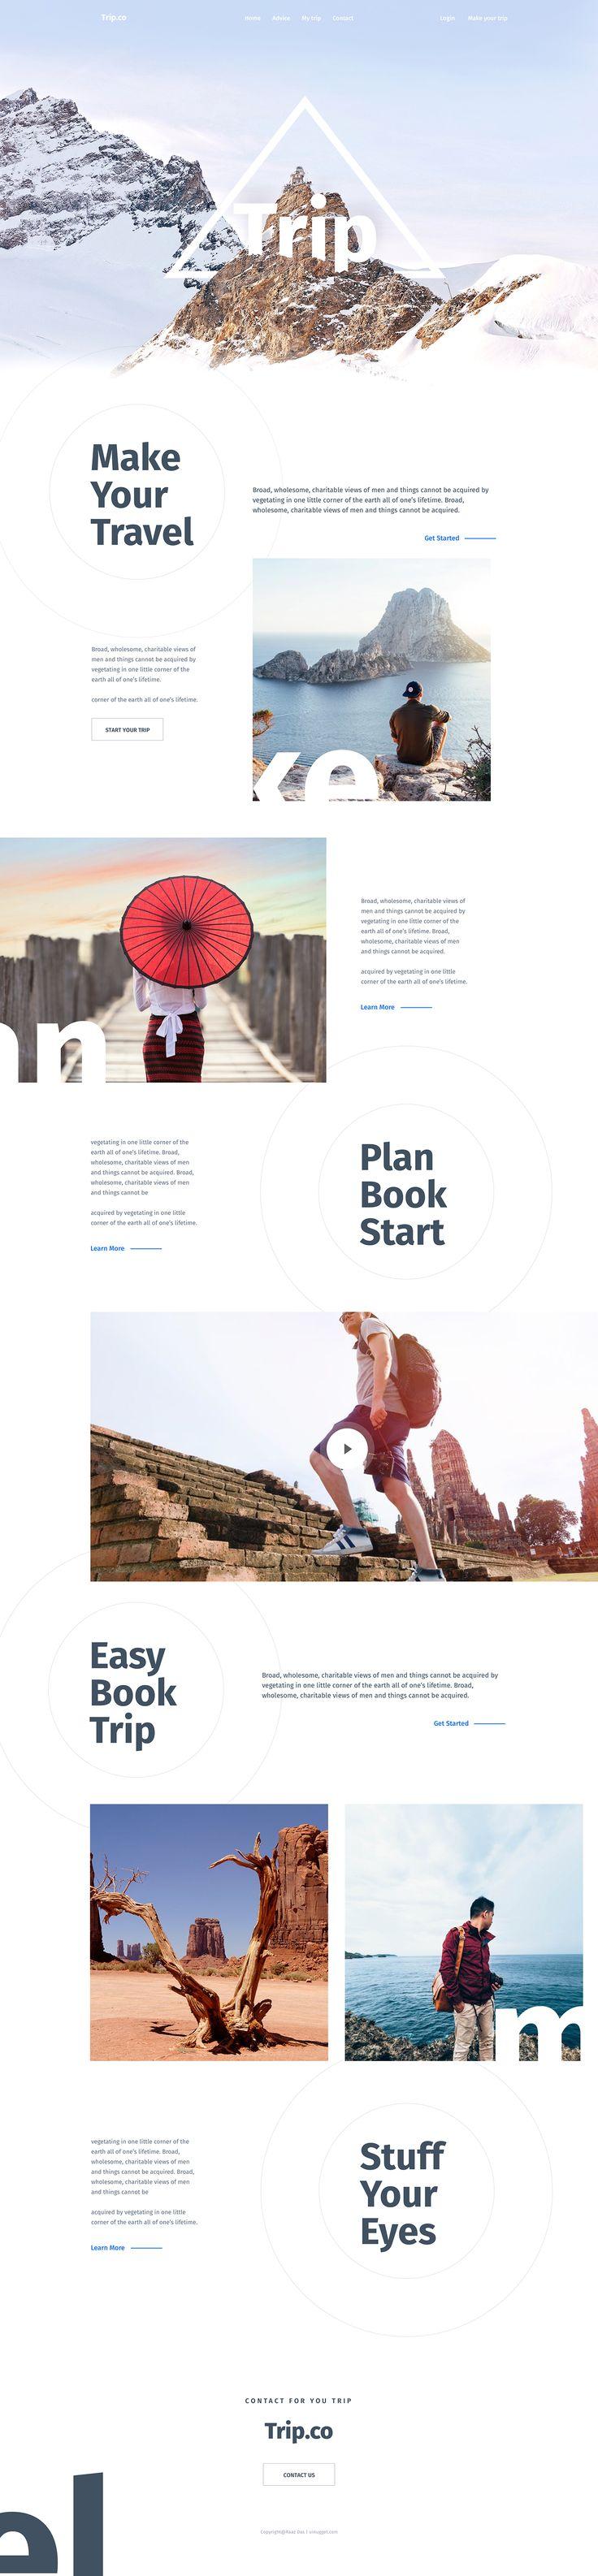 Travel Agency TRIP -  Ui design concept and visual identity by Surja Sen Das Raj